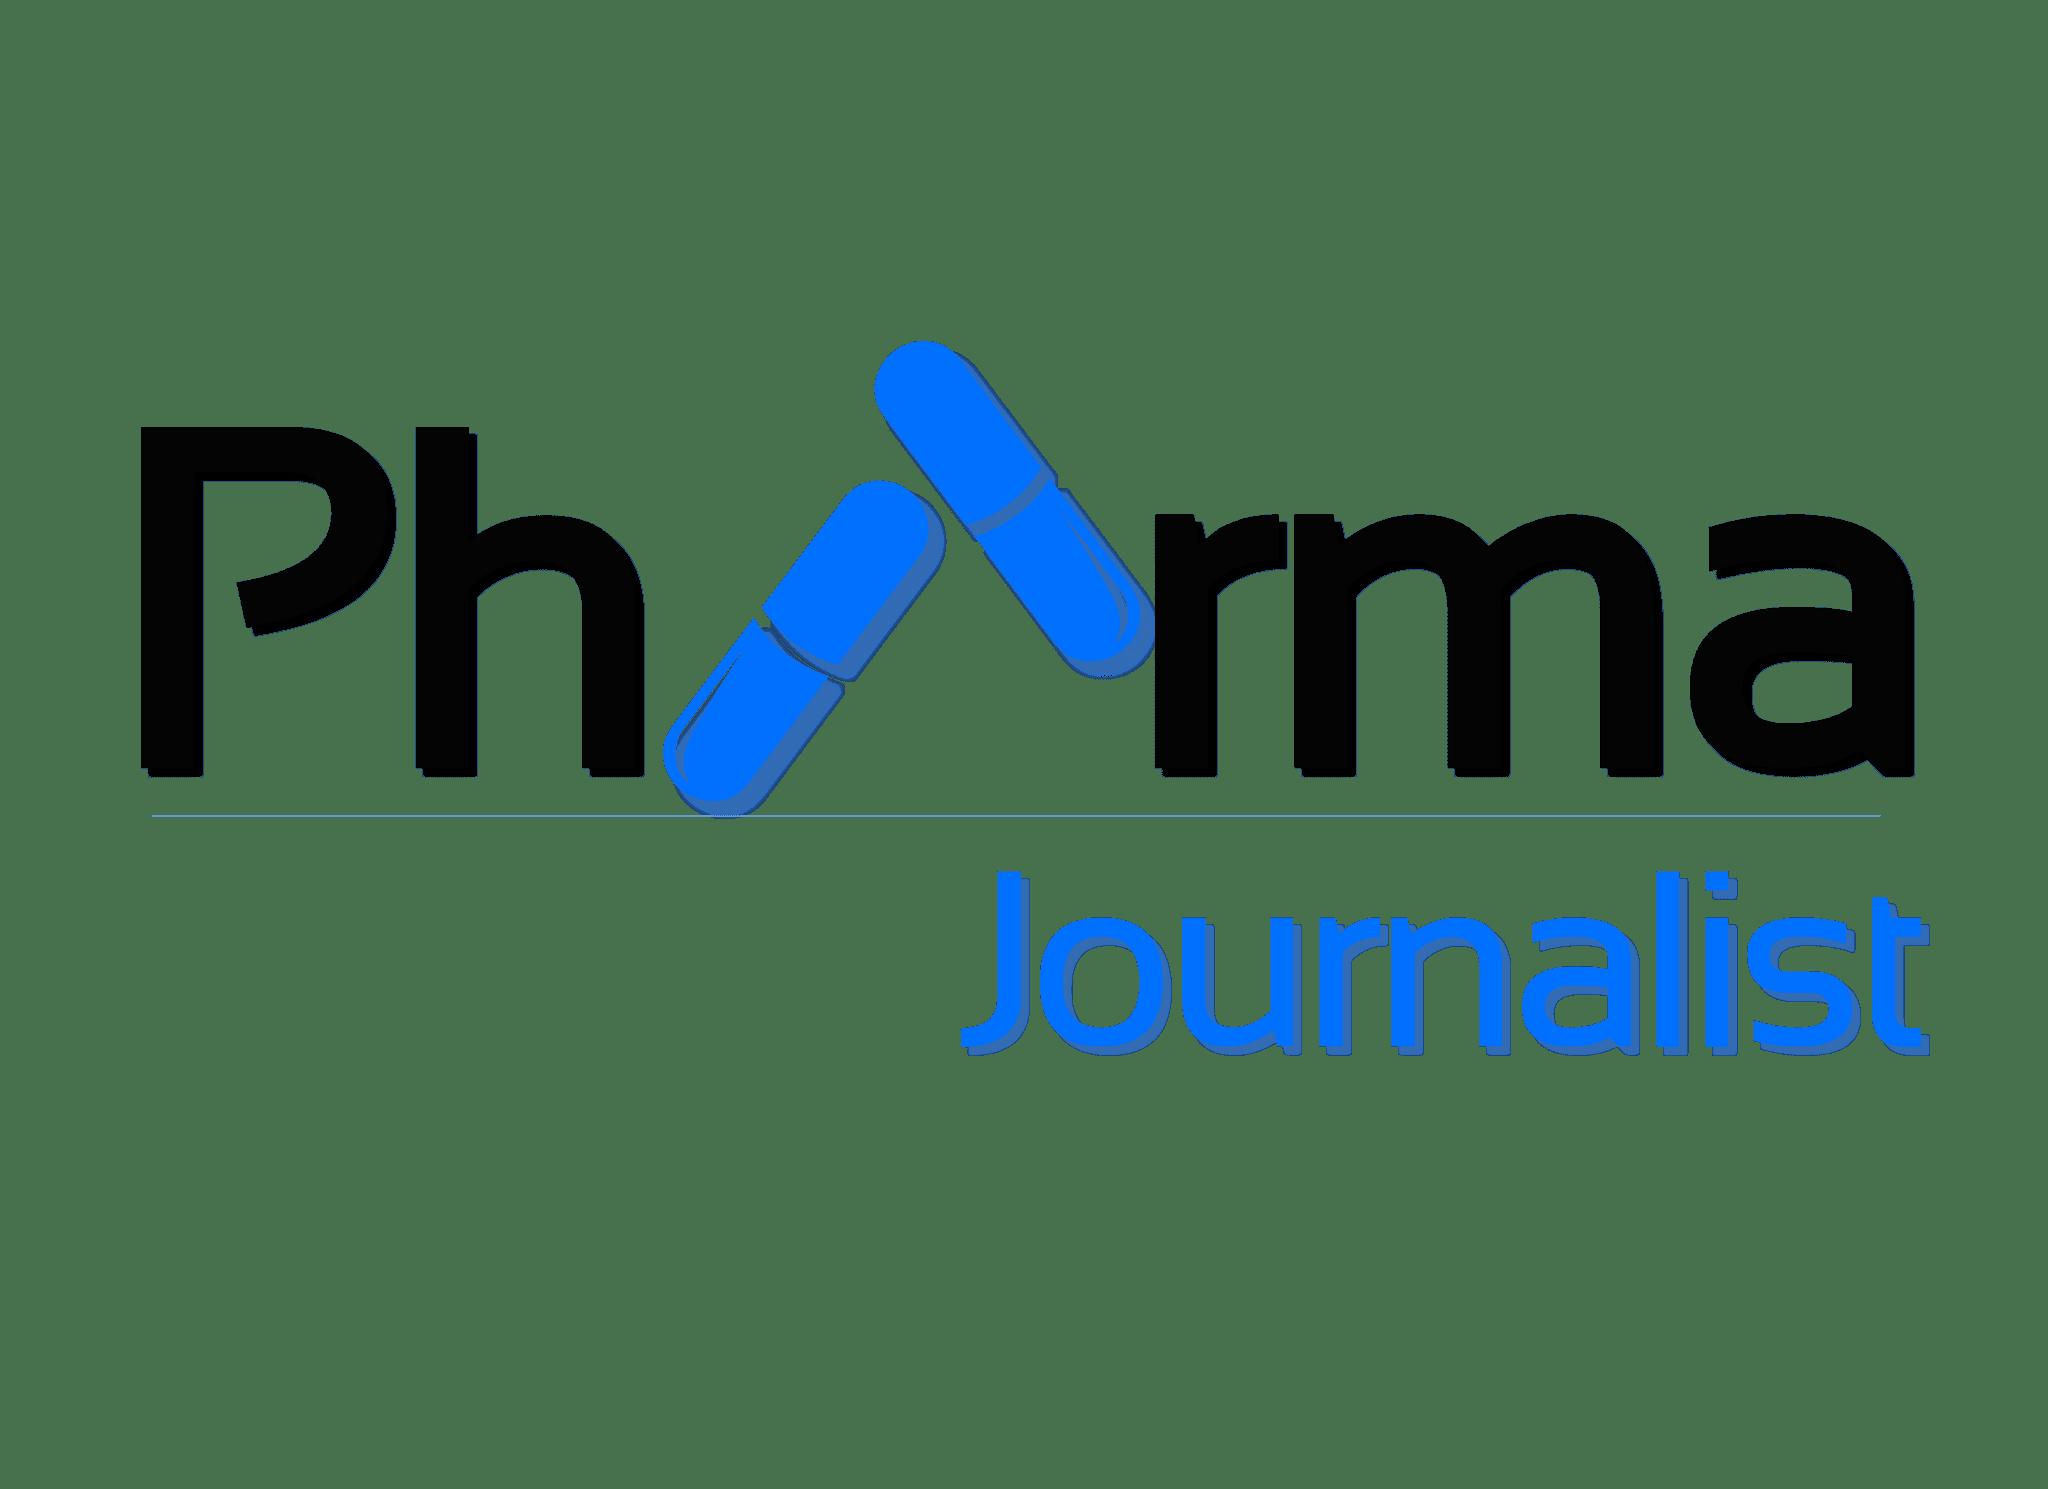 Pharma Journalist_Logo_High